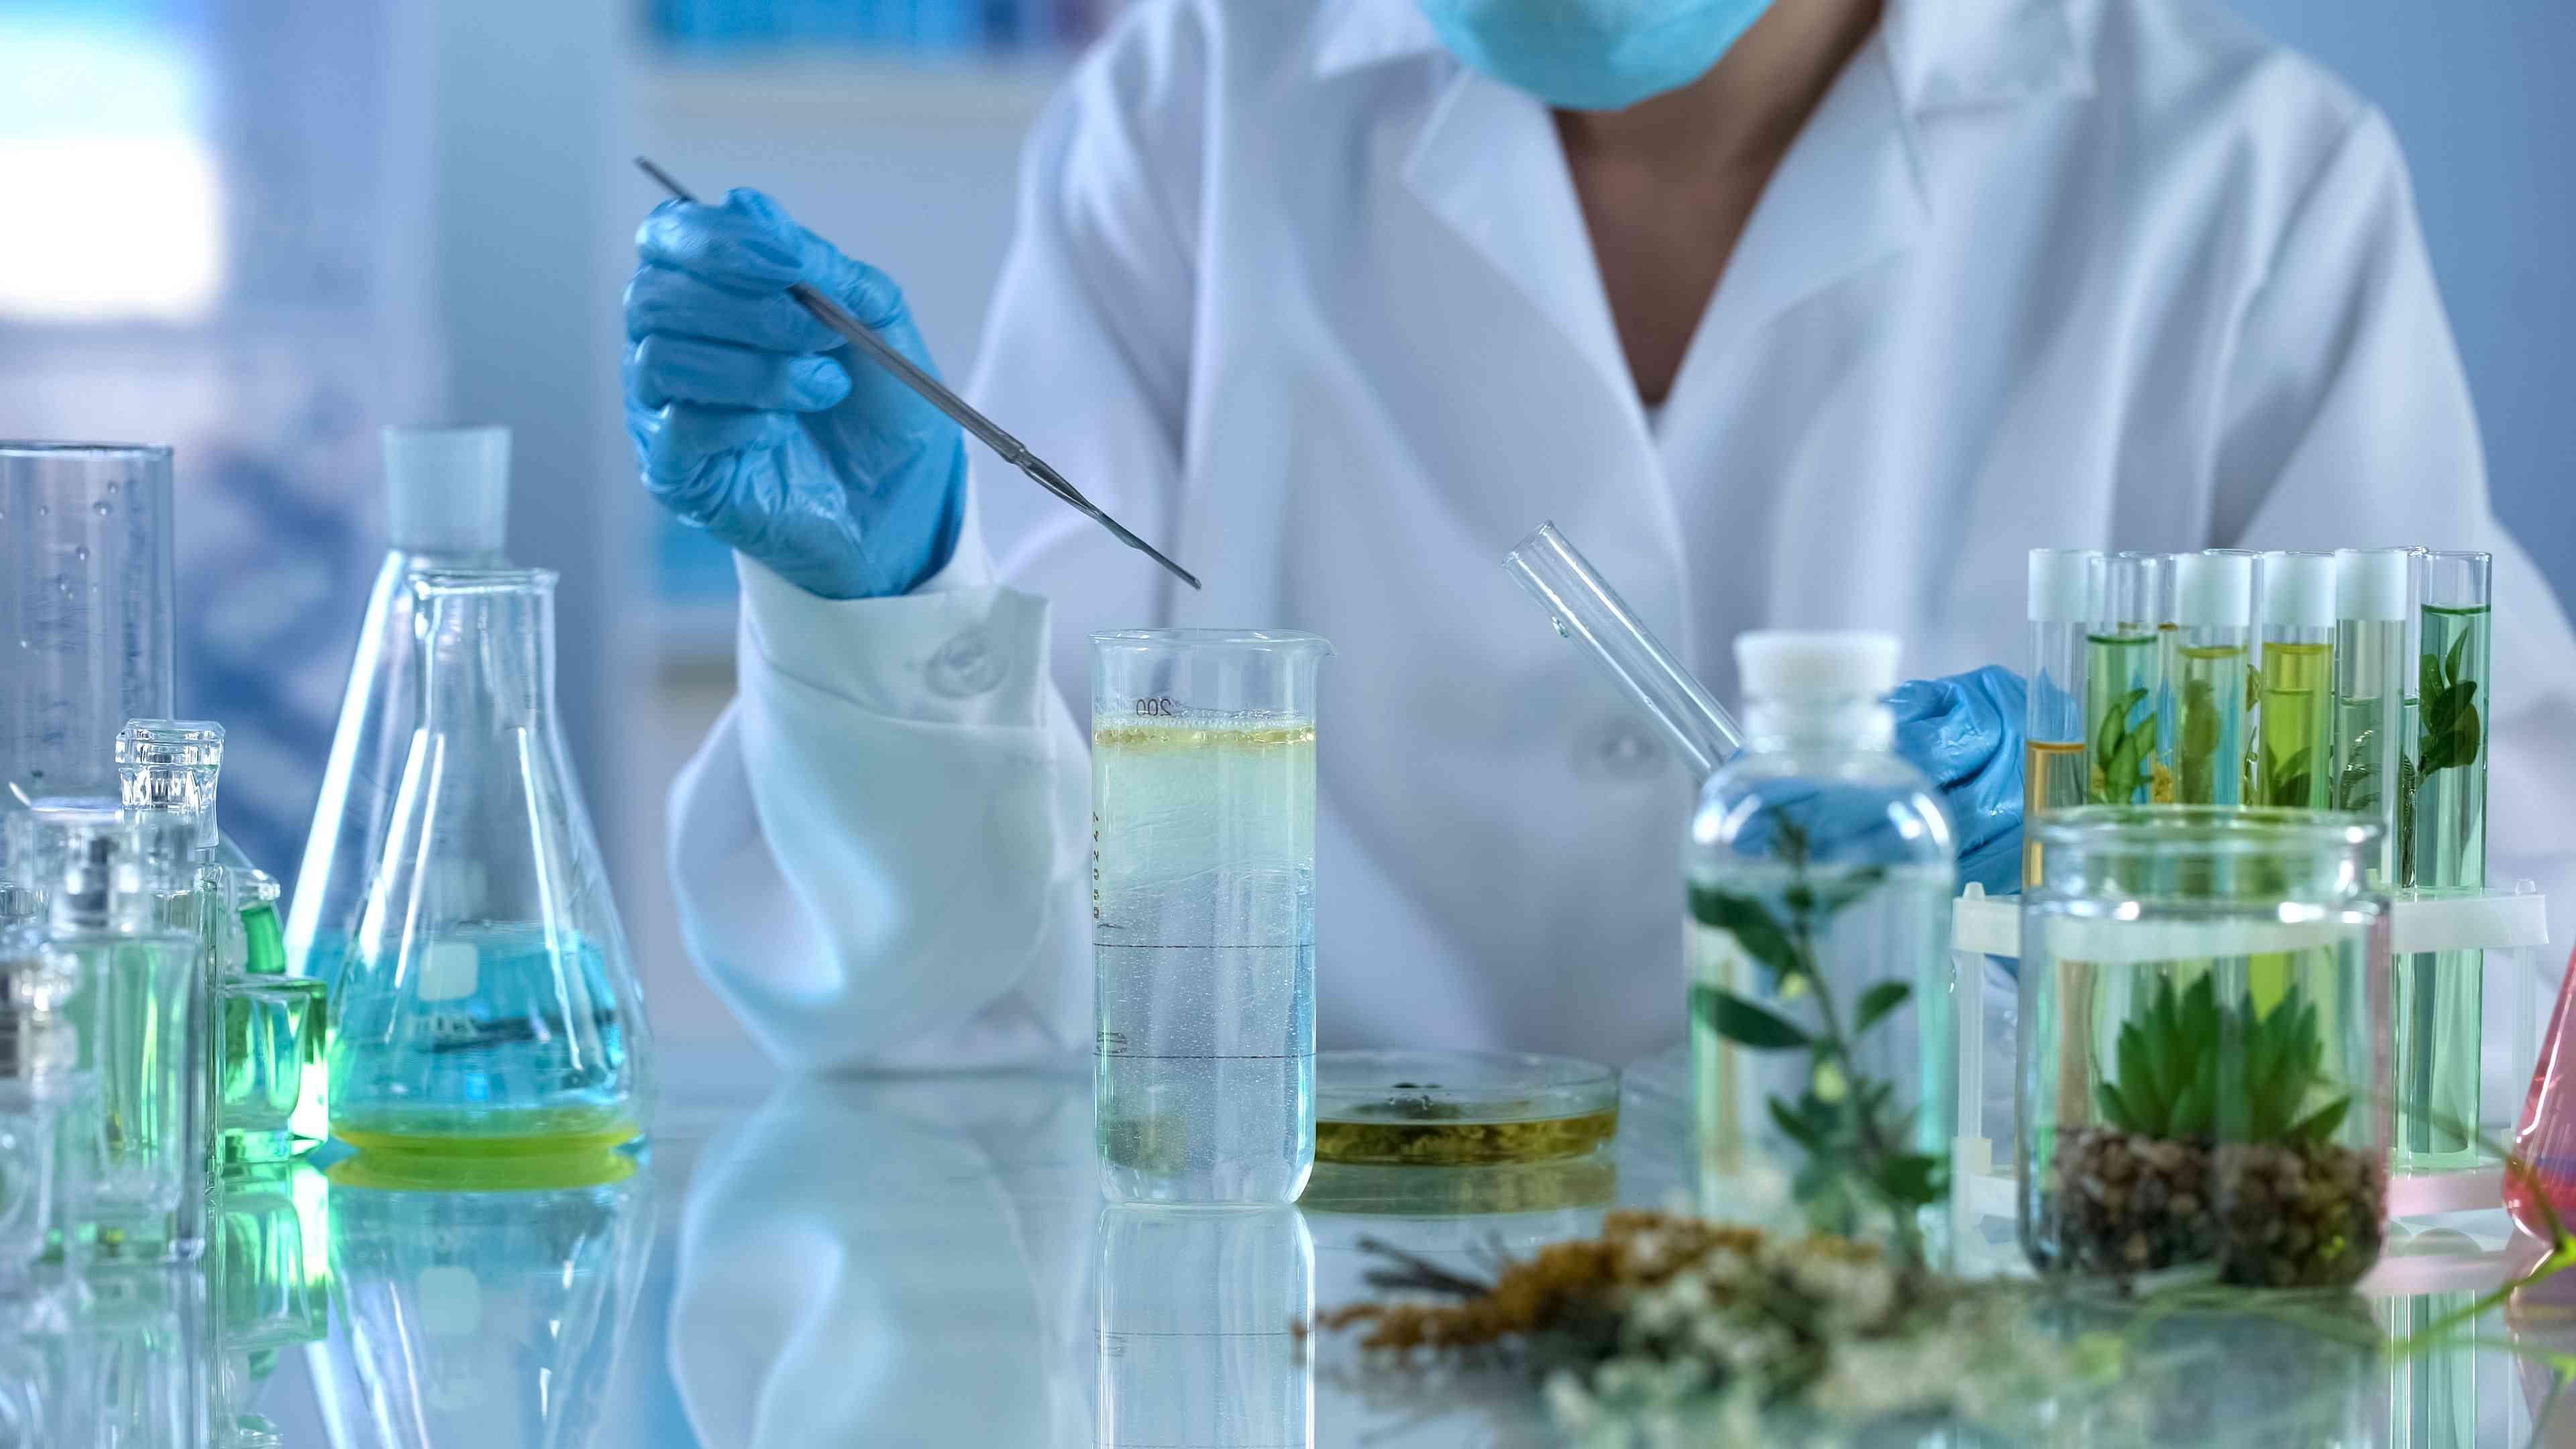 A scientist in a lab creating botanical formulas.